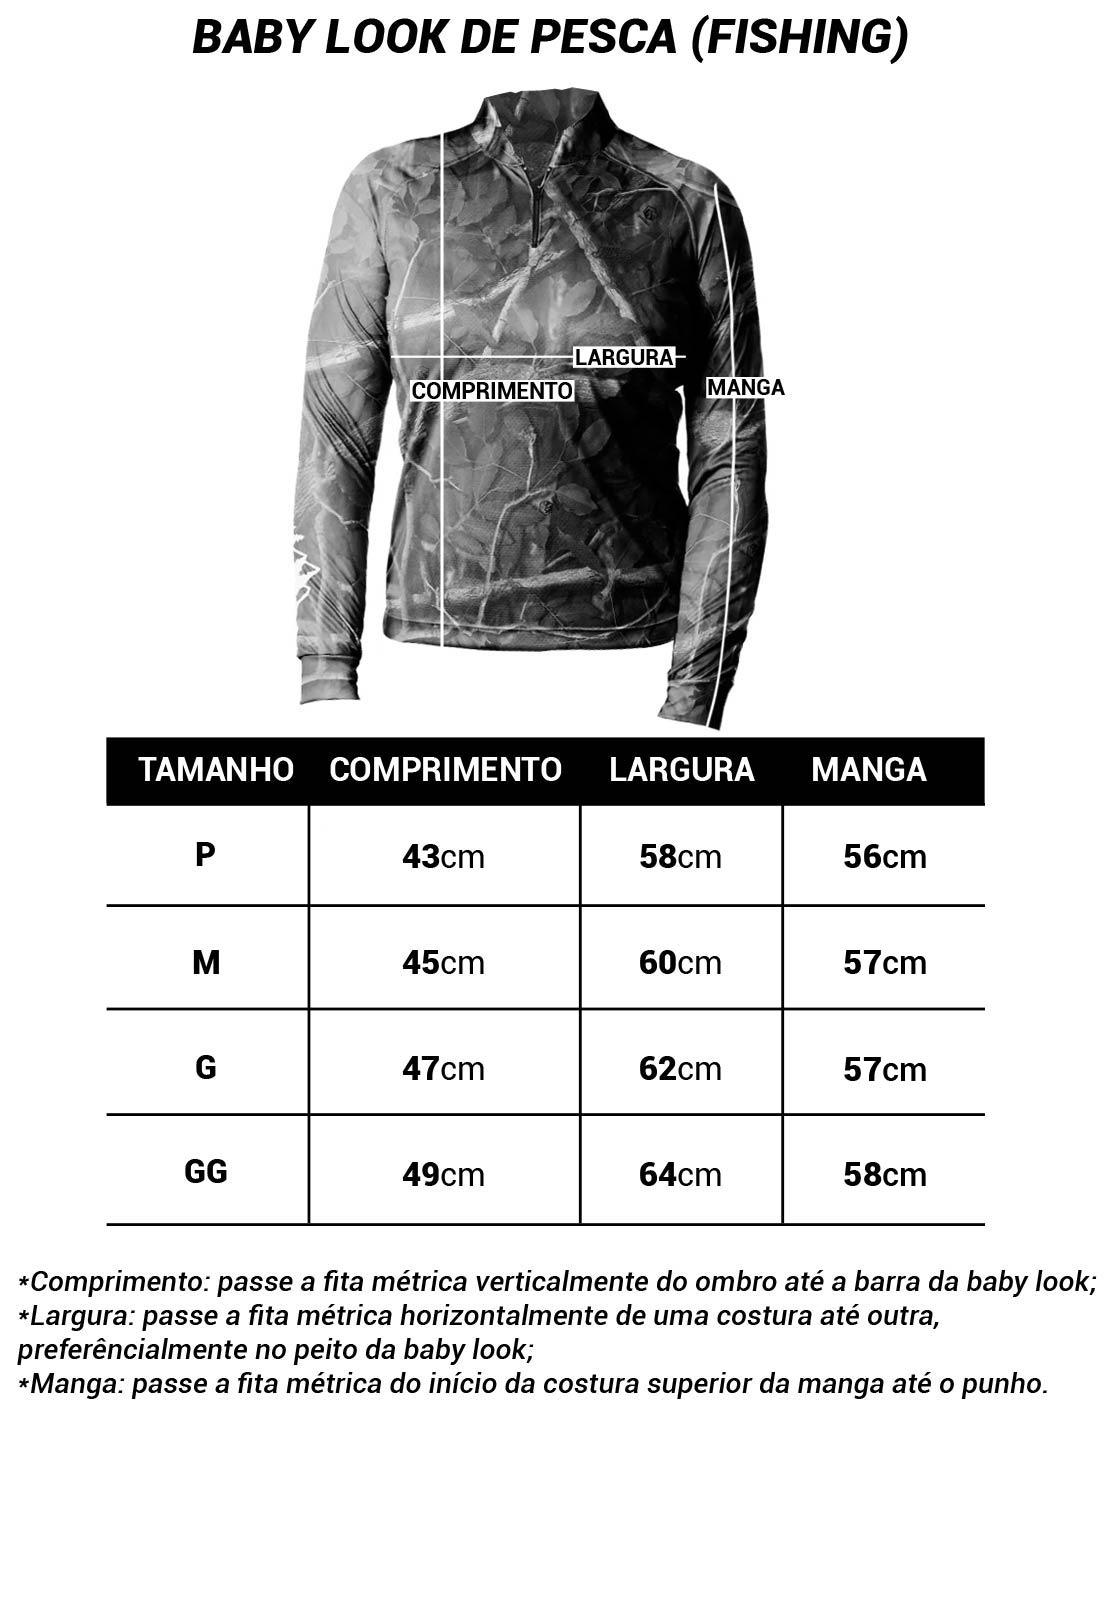 CAMISA DE PESCA FISH CAMUFLADA PRO 38 FEMININA + BANDANA GRÁTIS  - Real Hunter